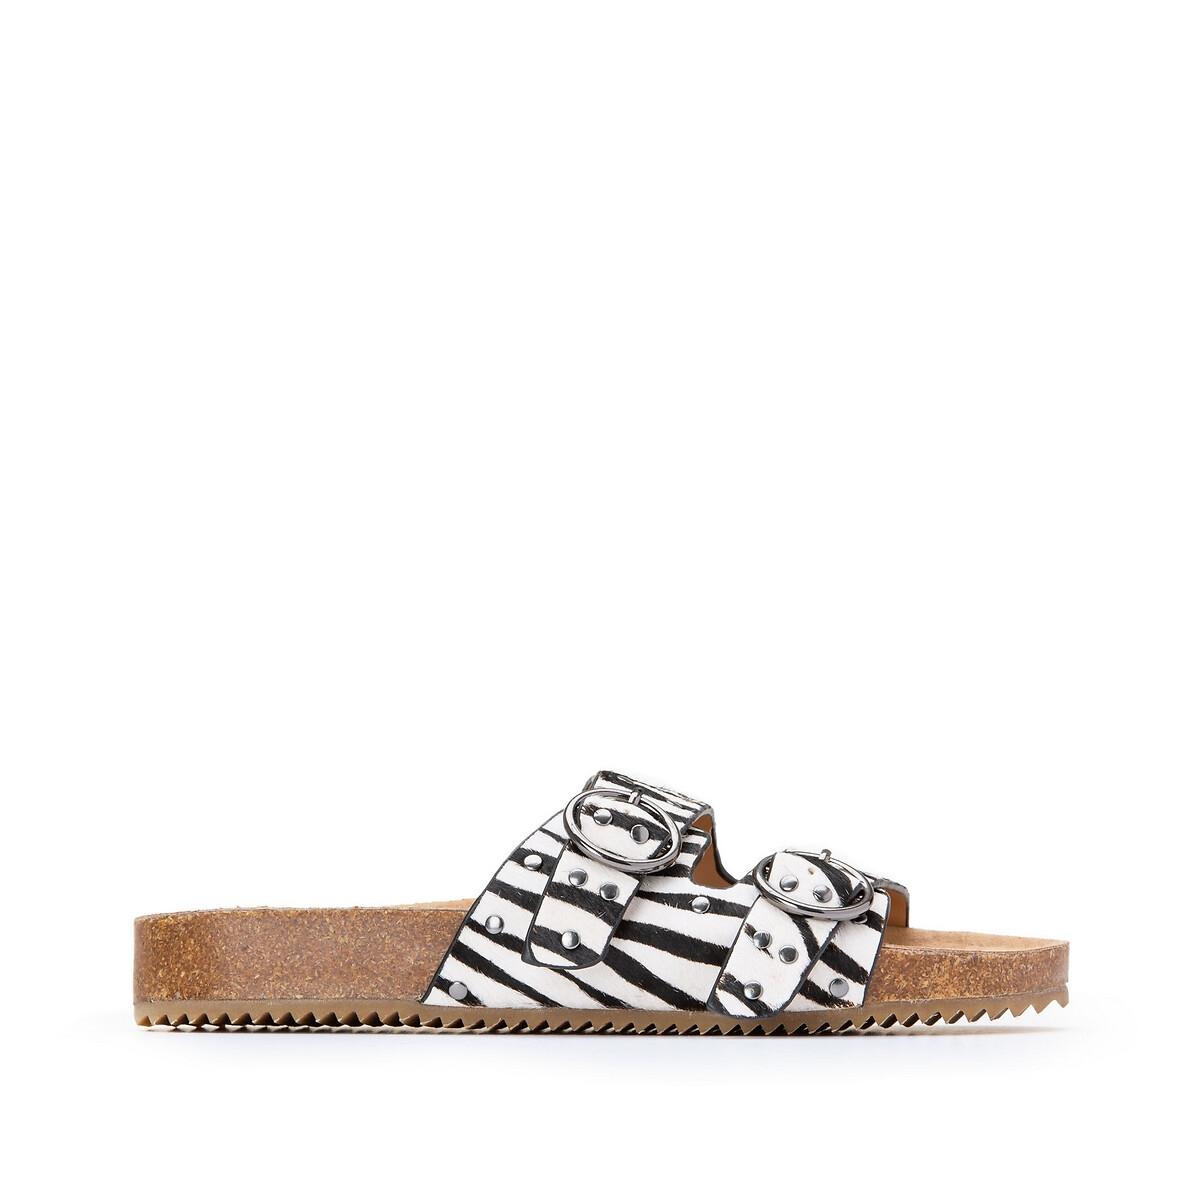 Туфли La Redoute Без задника из кожи с принтом зебра 41 синий